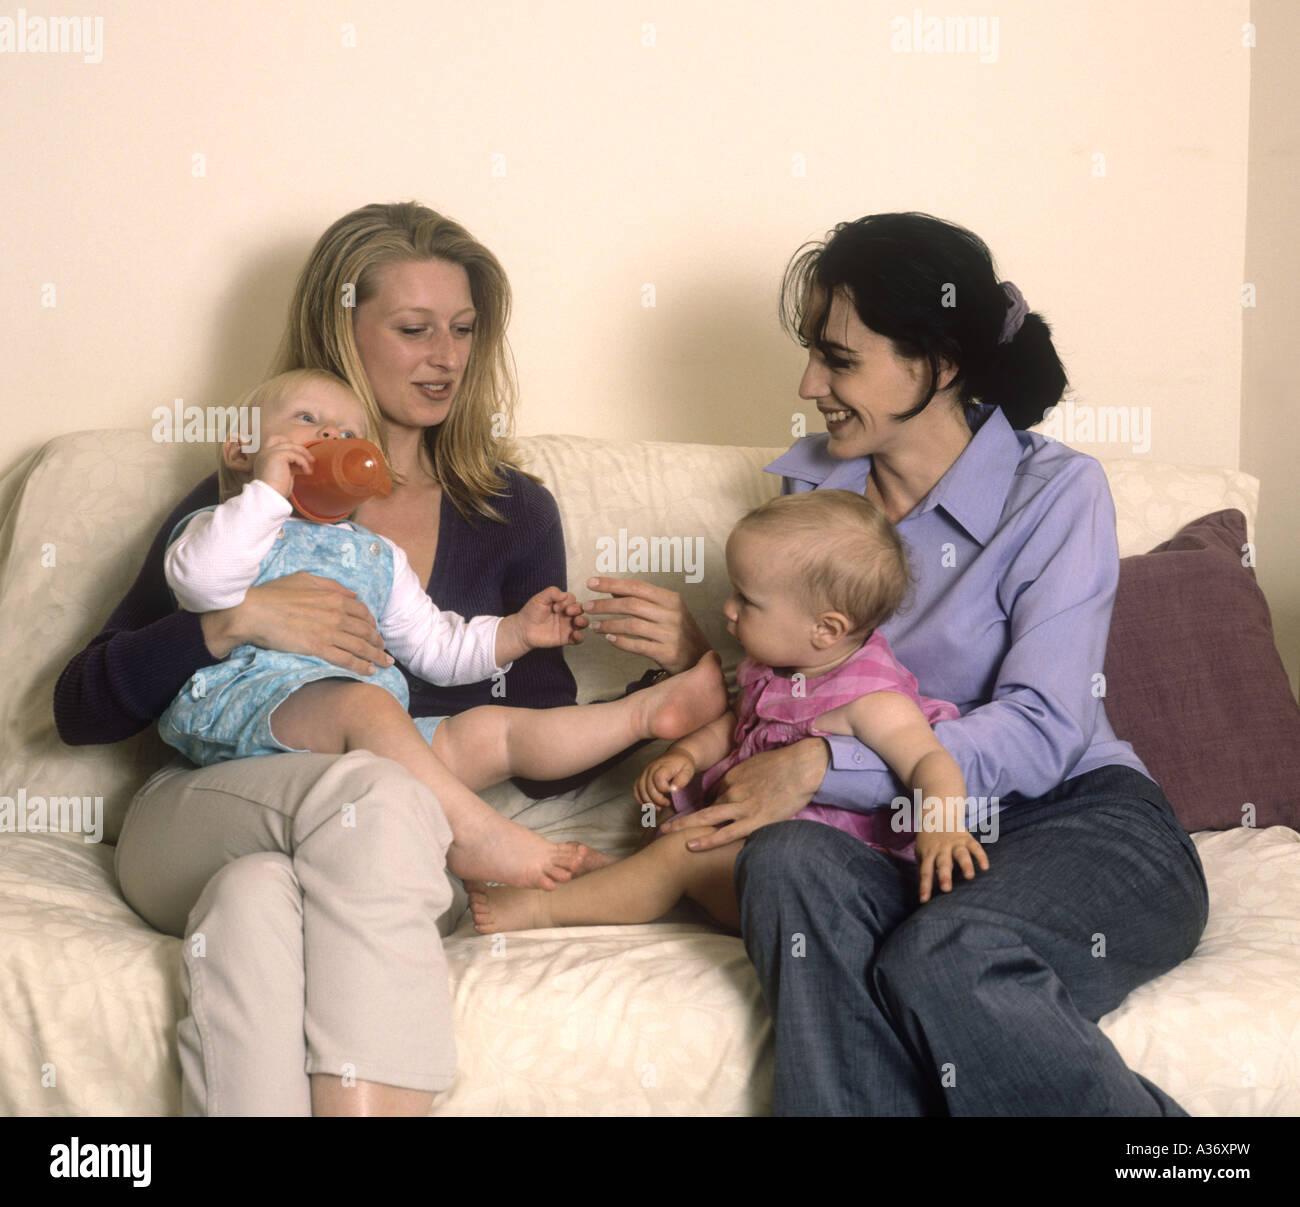 inflatable bubble sofa uk austin furniture child minder stock photos & images - alamy